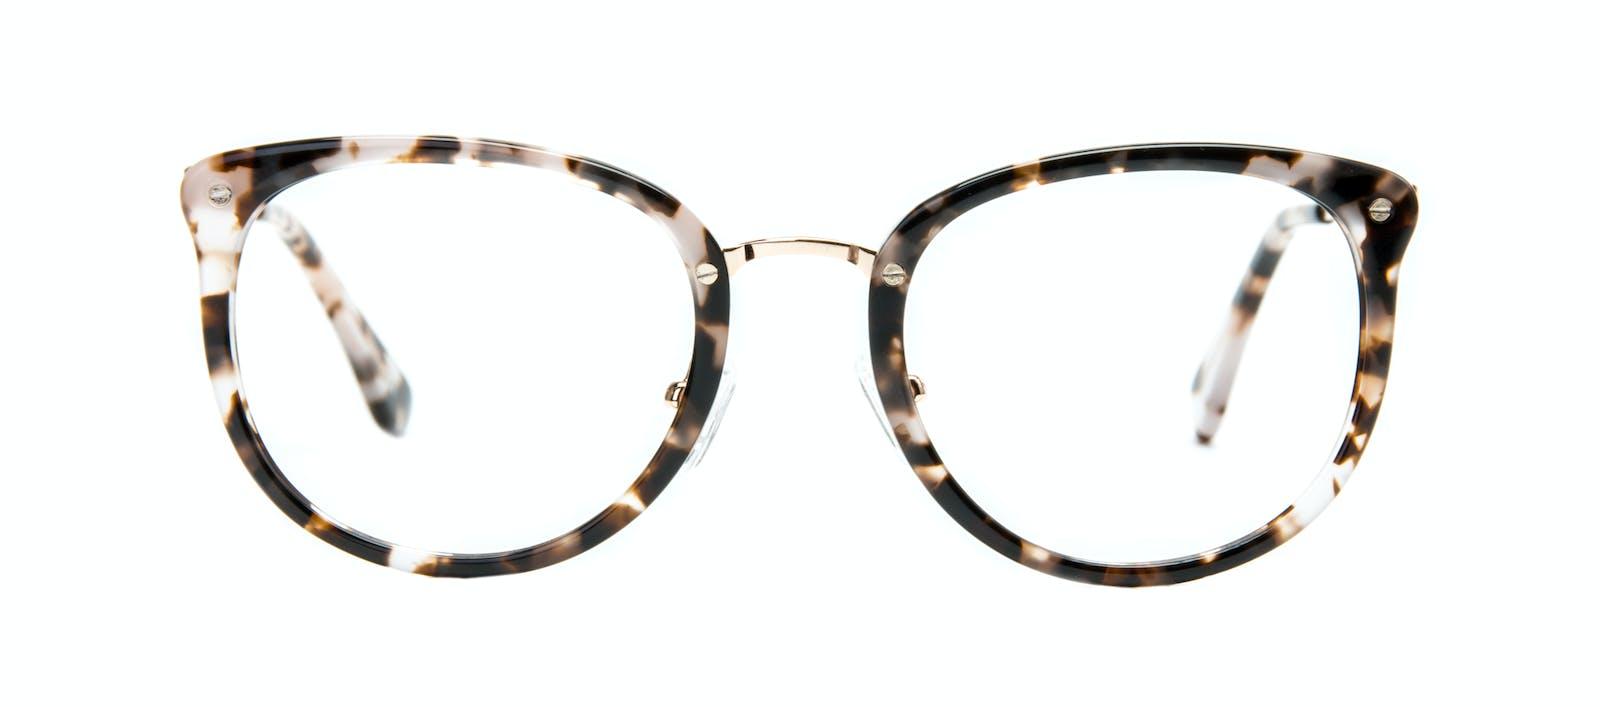 50a08ec8d8 Affordable Fashion Glasses Square Round Eyeglasses Women Amaze Mocha  Tortoise Front